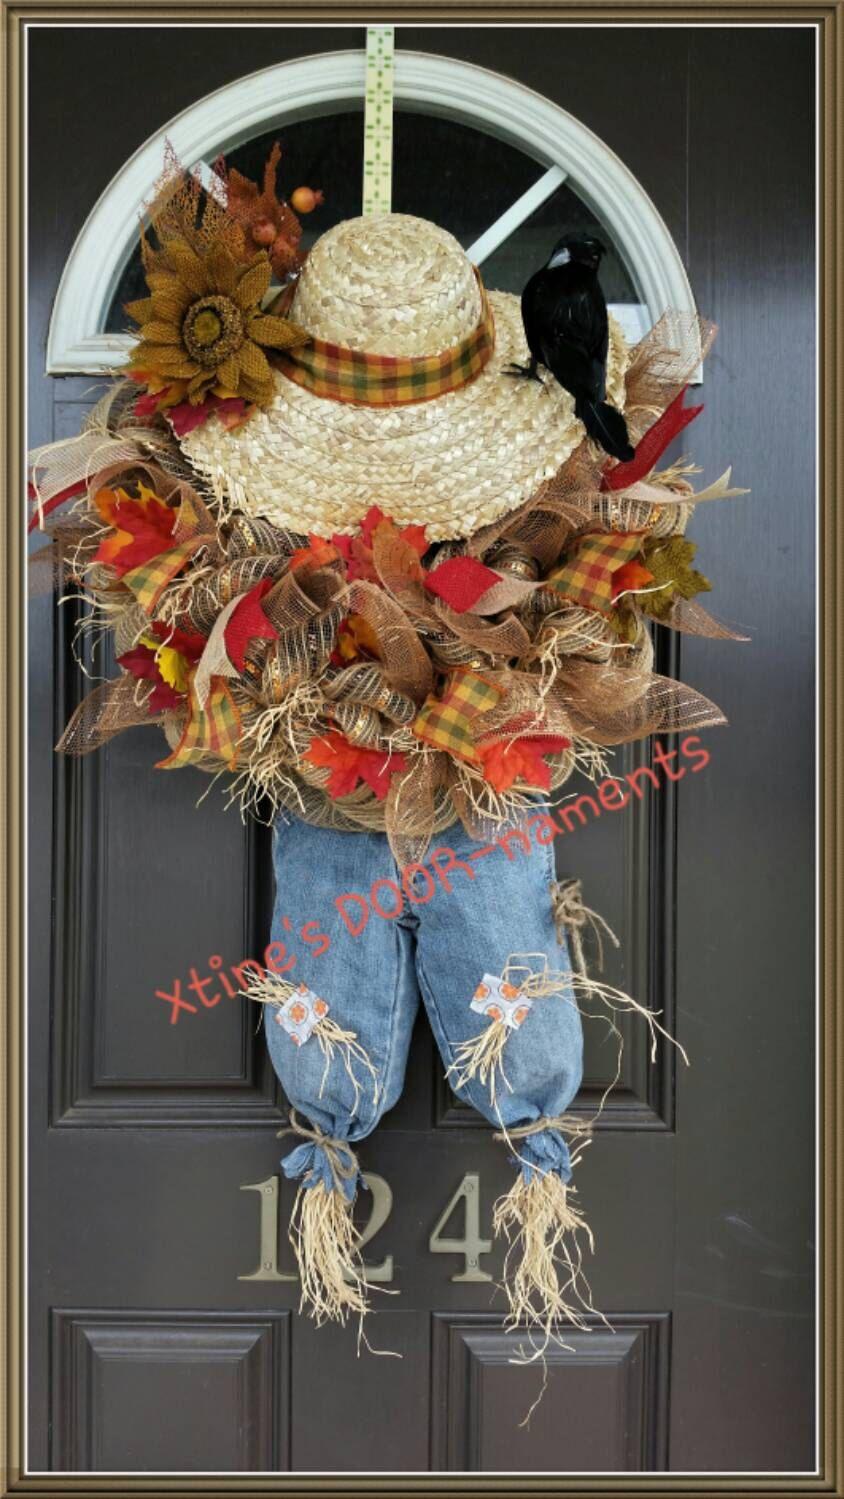 30 Gorgeous Fall Wreaths | Scarecrow wreath, Scarecrows and Wreaths